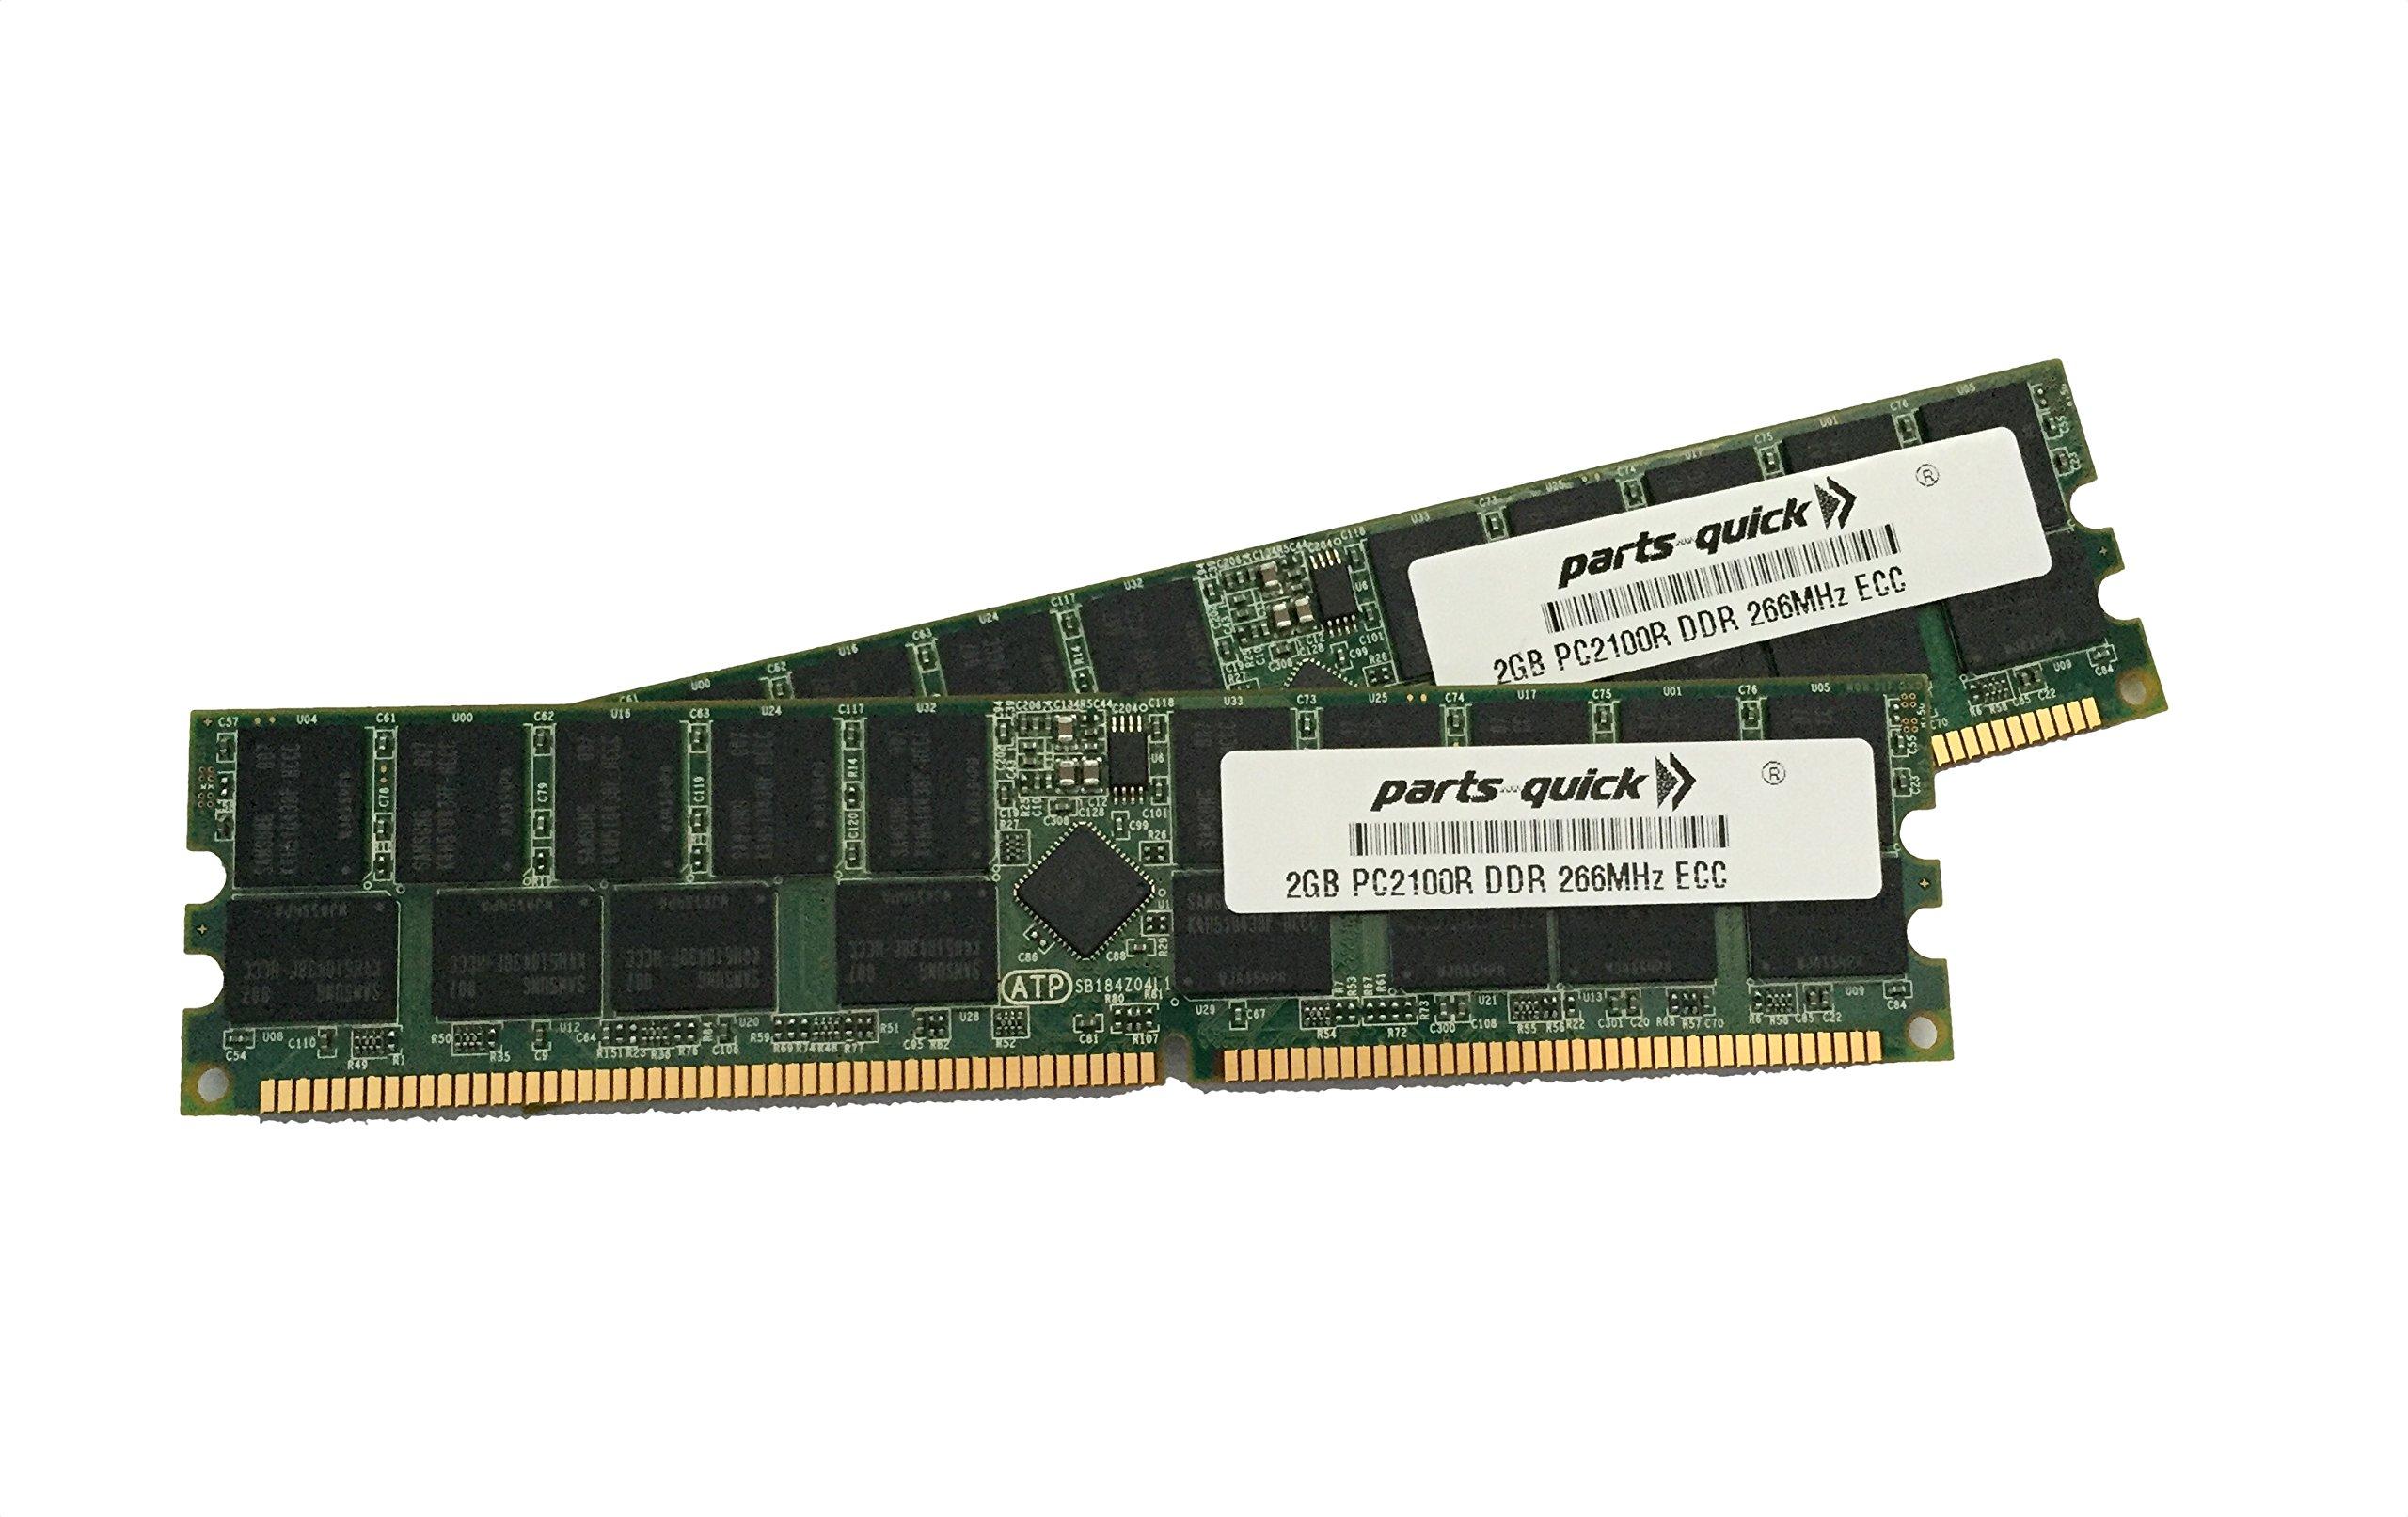 parts-quick 4GB Kit (2 X 2GB) PC2100 Registered 266MHz 184 pin DDR SDRAM ECC DIMM Memory RAM for Dell PowerEdge 650 1750 2600 2650 Server Brand